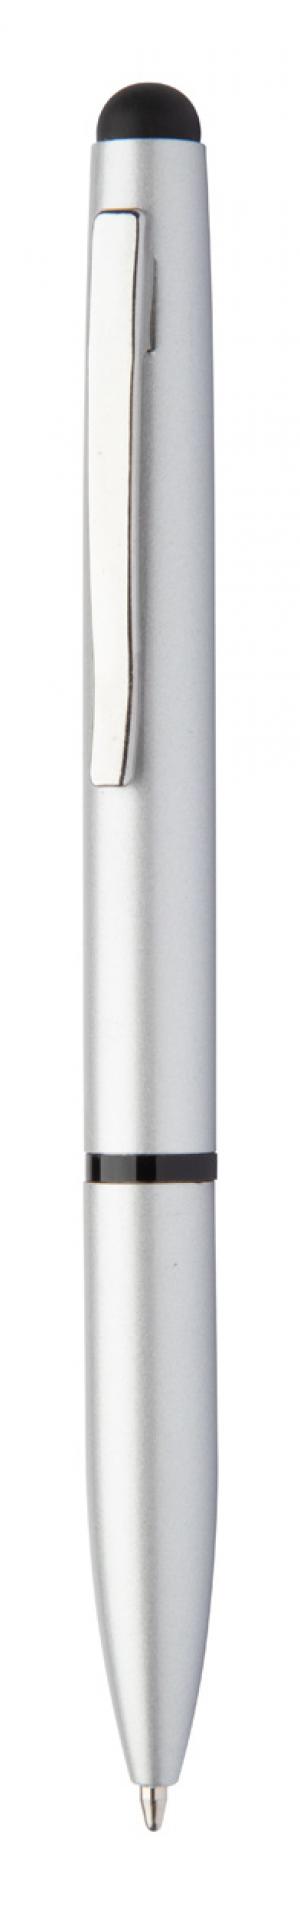 Verslo dovanos Lintal (ballpoint pen)